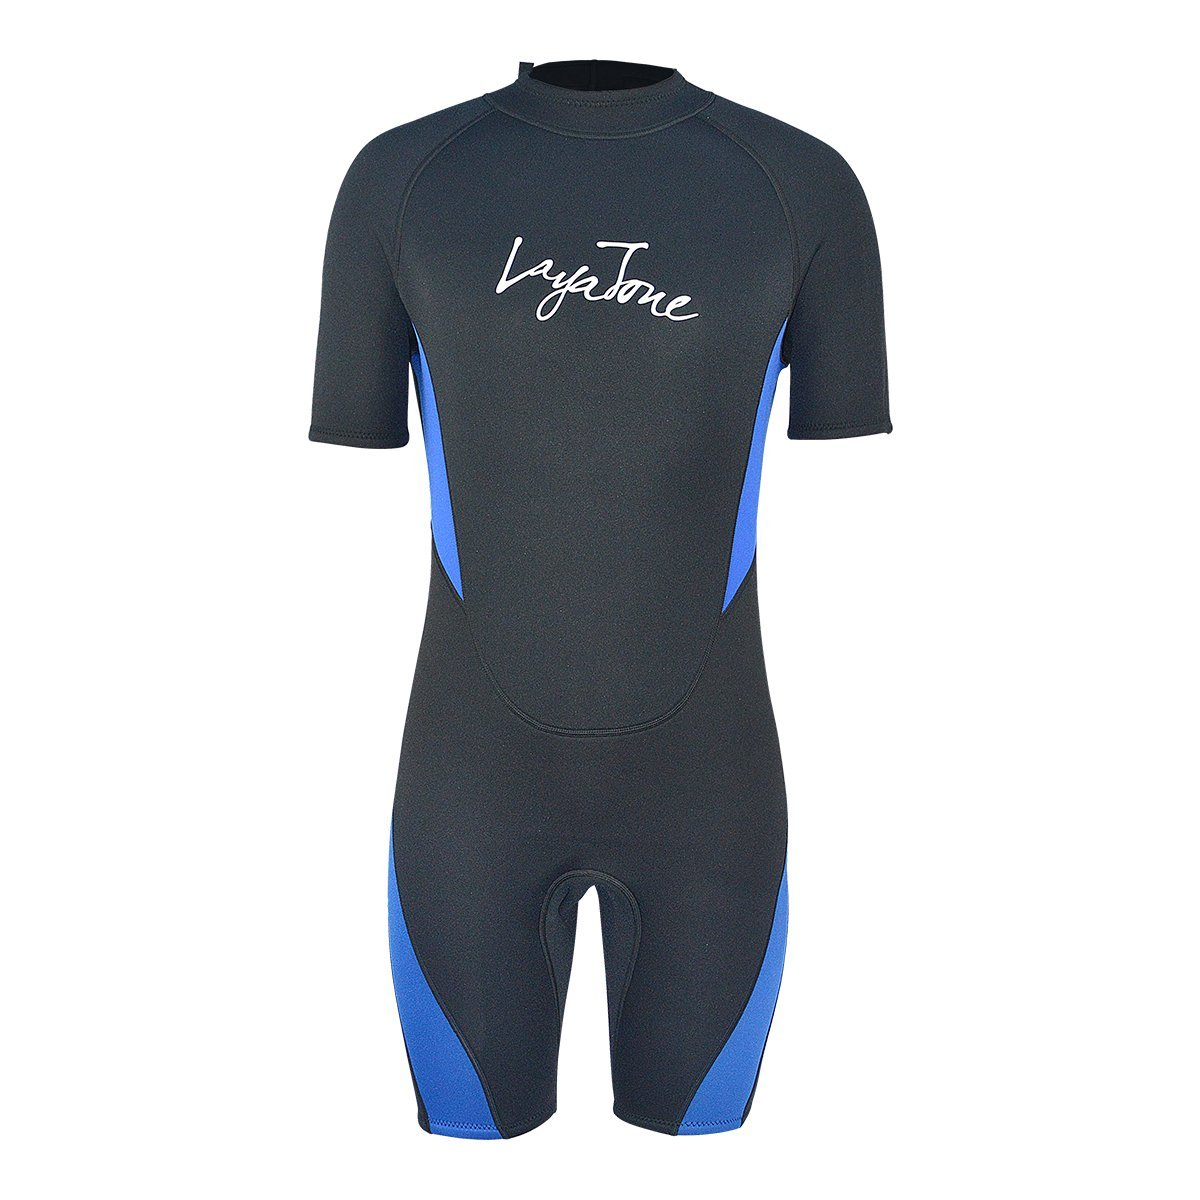 6123e87b9c Get Quotations · Layatone Wetsuit Shorts for Men Premium 3mm Neoprene  Diving Suit Keep Warm Wetsuits for Women -